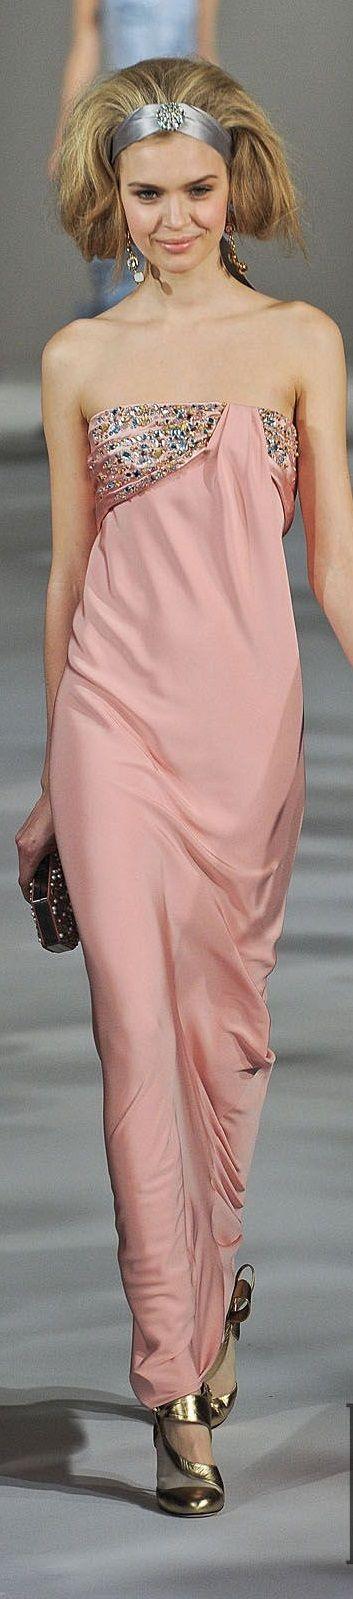 Oscar de la Renta women fashion outfit clothing style apparel @roressclothes closet ideas